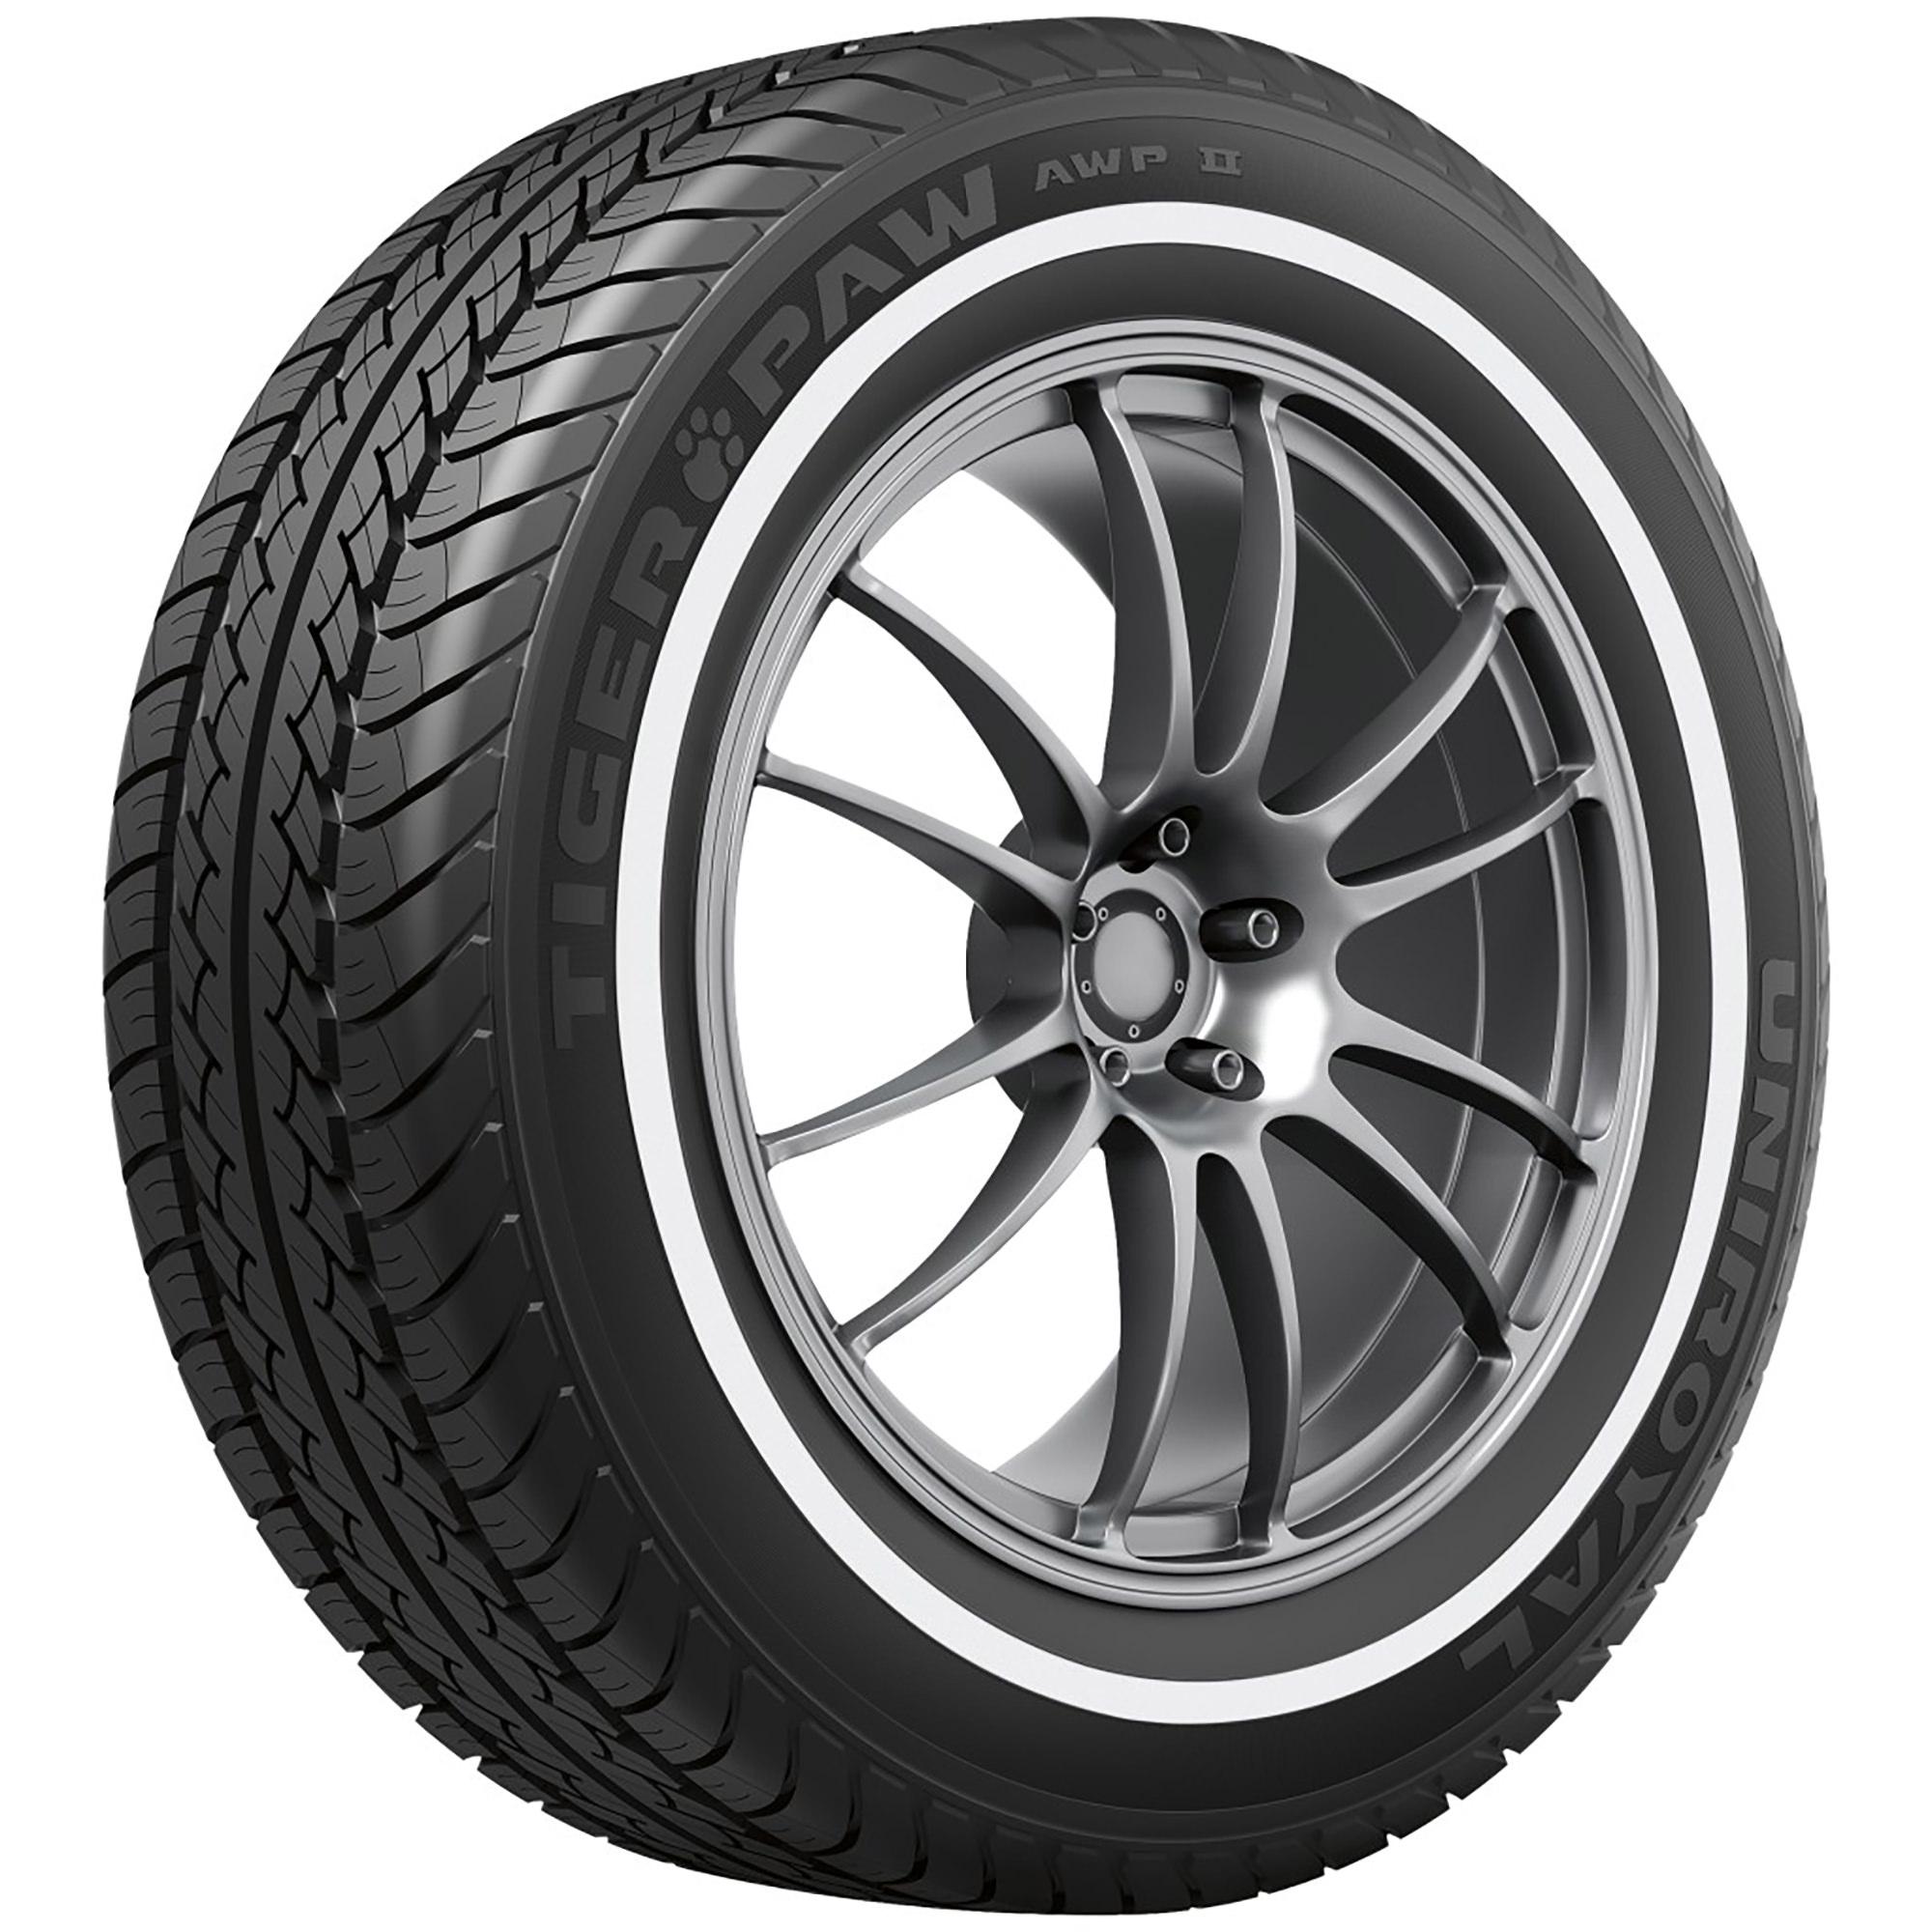 tiger paw tires Hankook Ventus St RH06 uniroyal tiger paw awp ii all season tire p185 75r14 89s